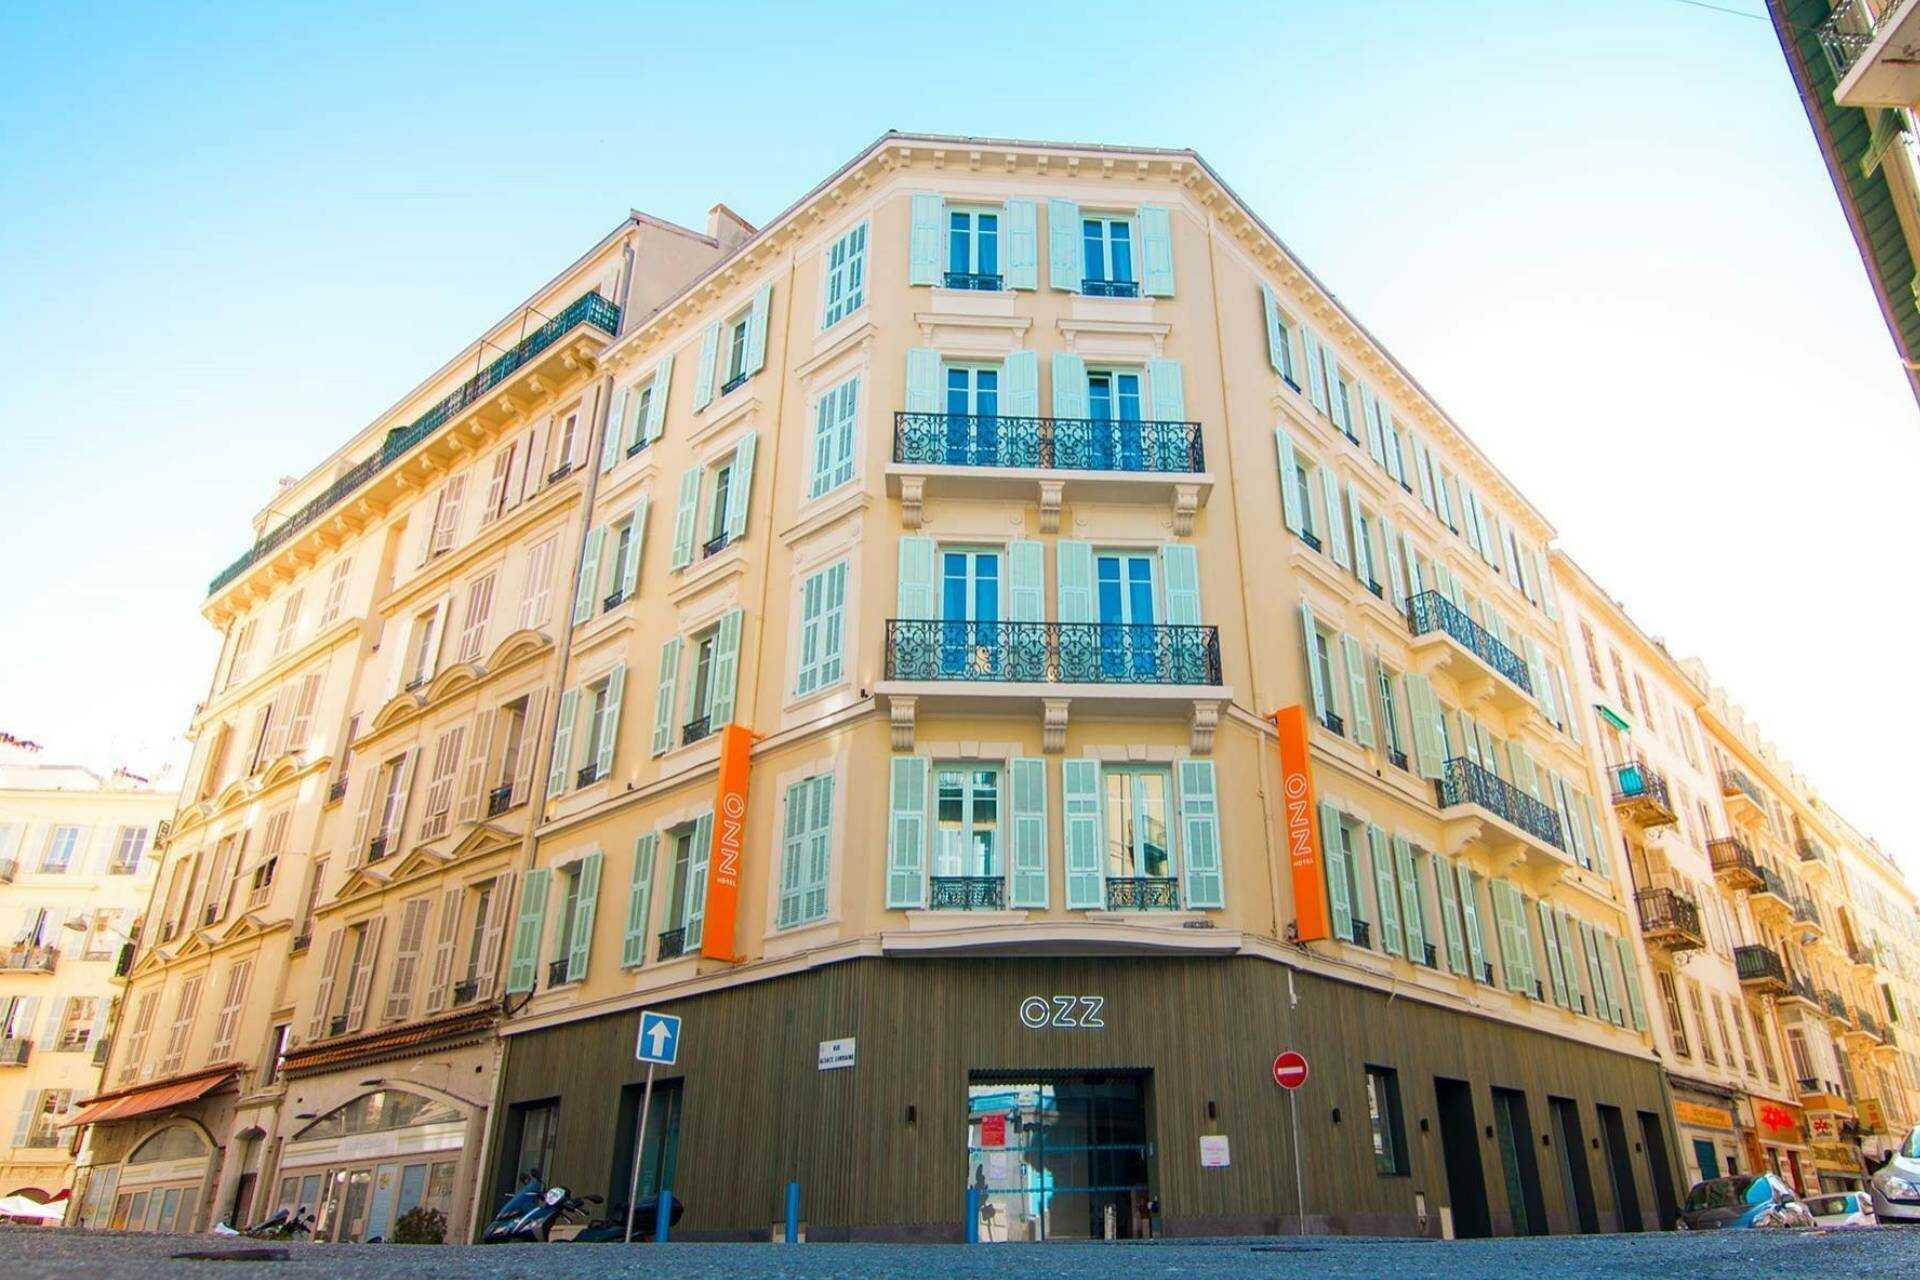 facade_hostel_ozz.jpg